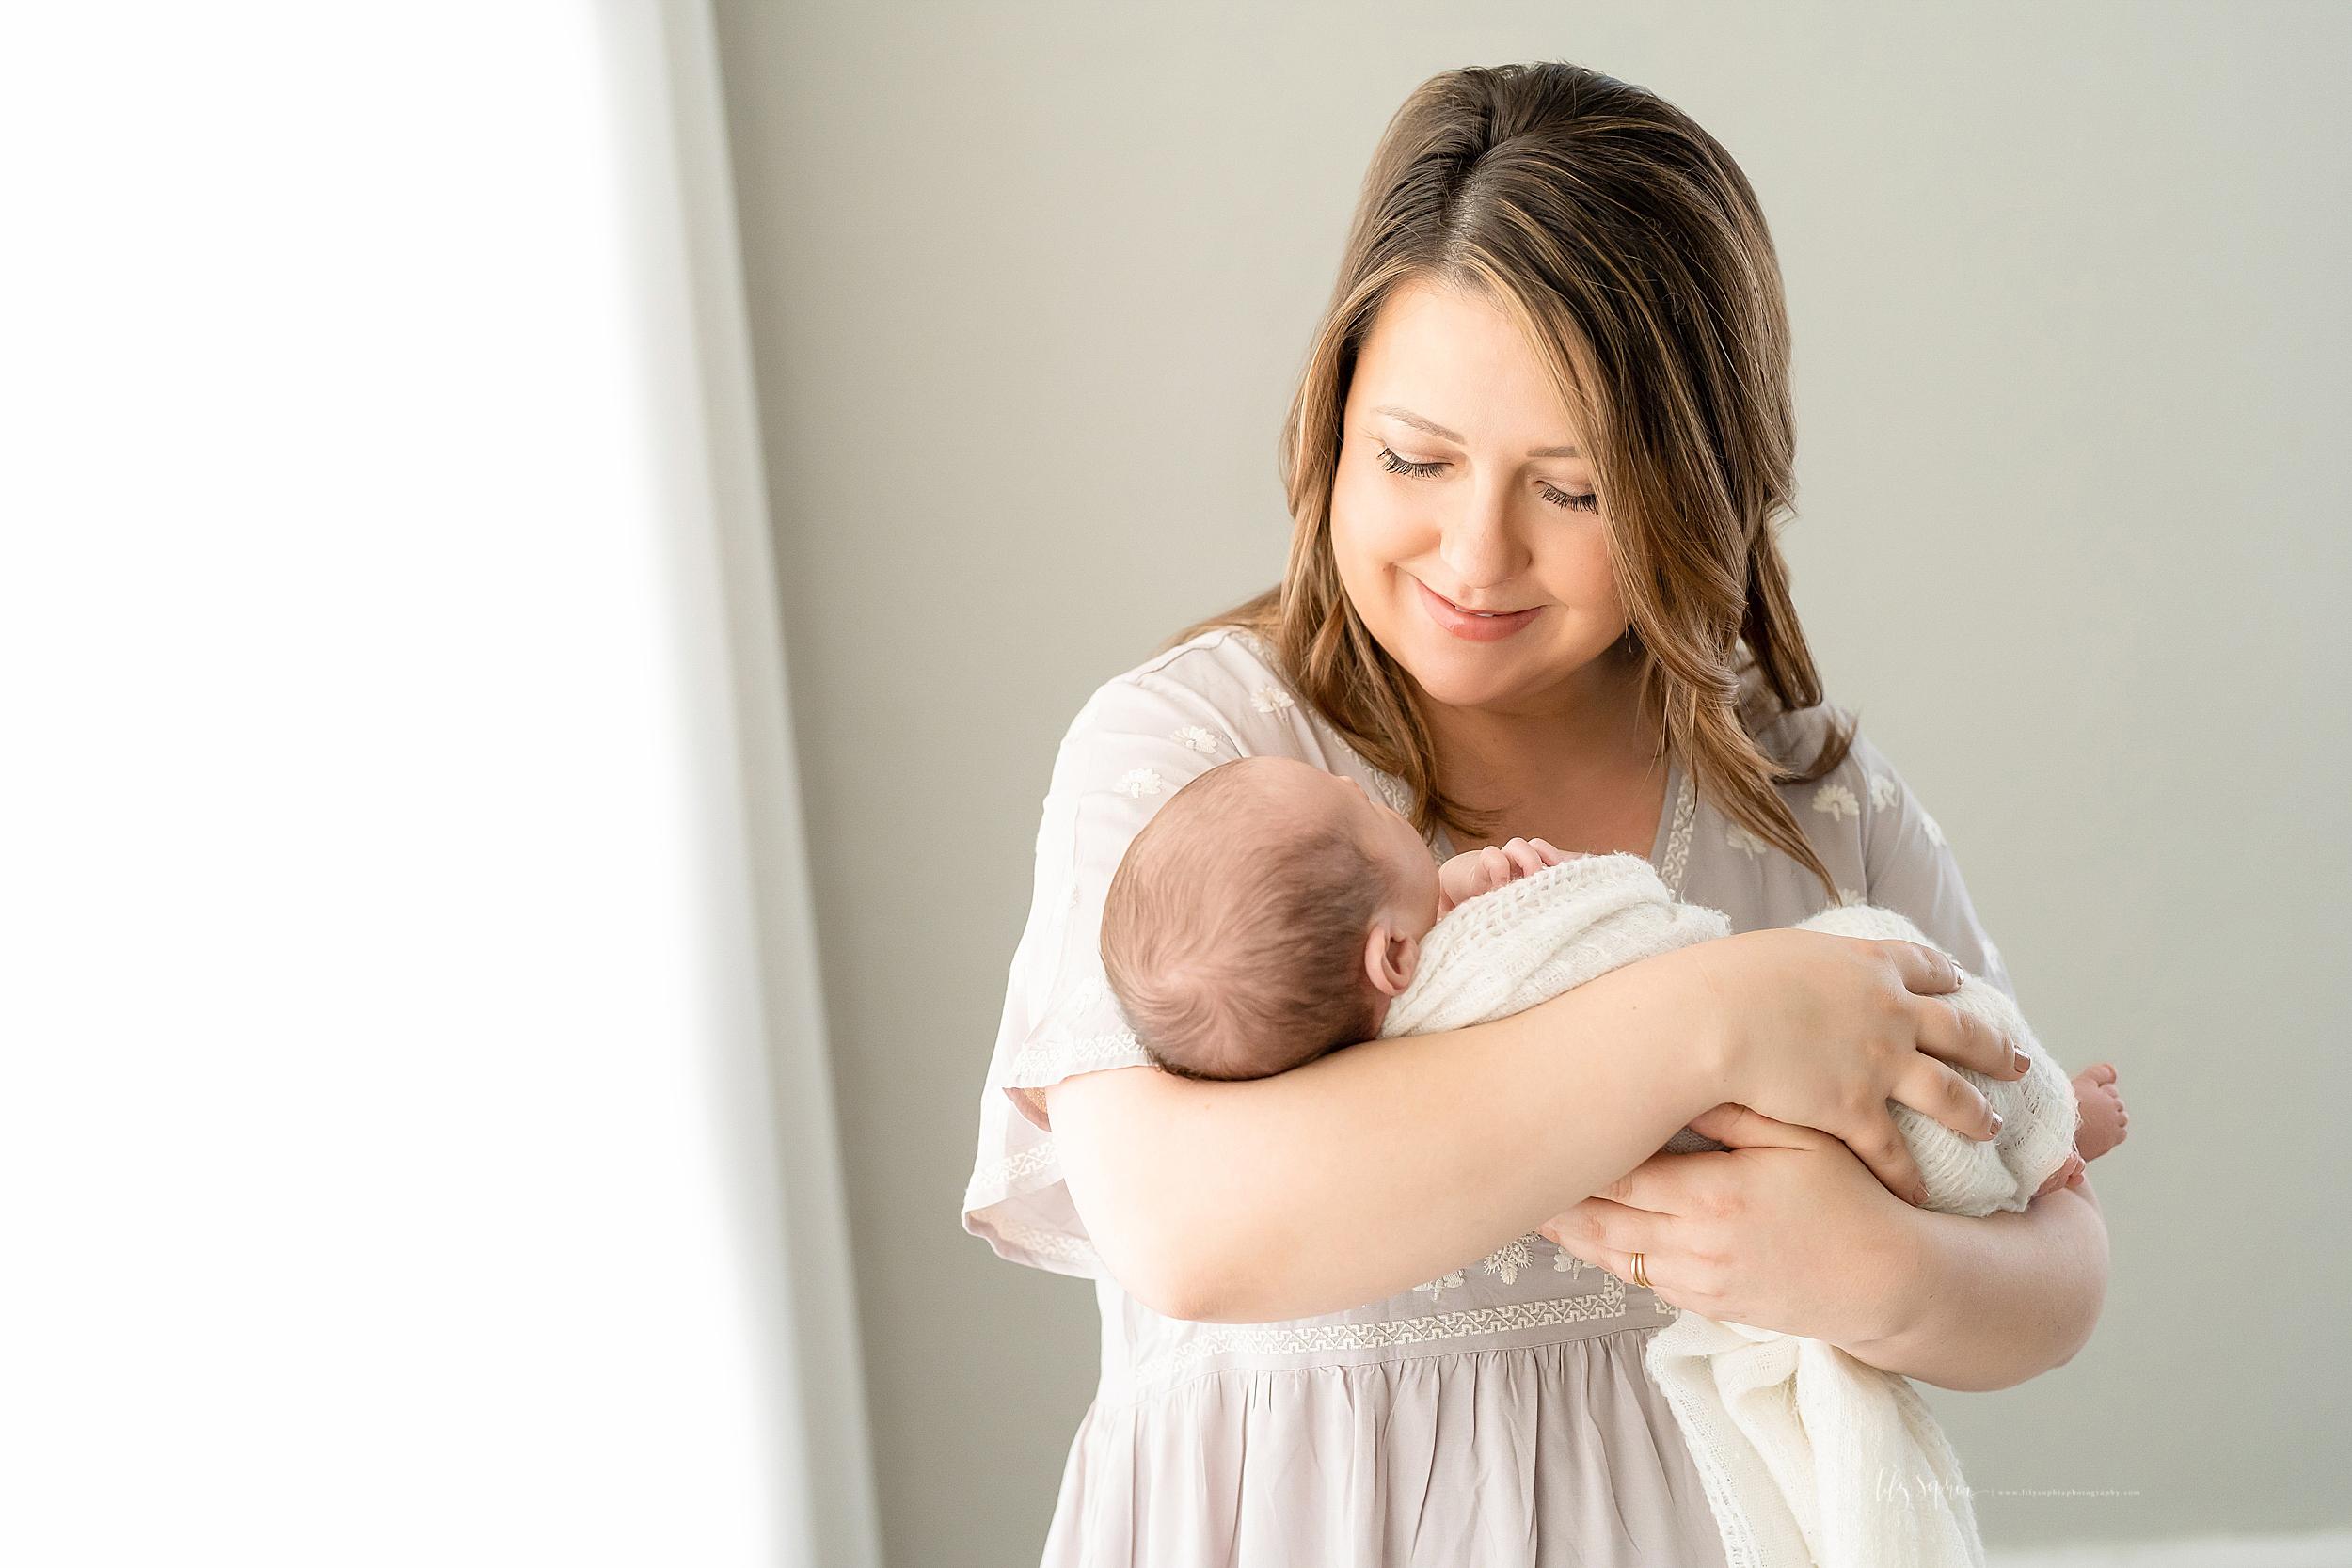 atlanta-cumming-brookhaven-alpharetta-virginia-highlands-smyrna-decatur-lily-sophia-photography-studio-newborn-baby-boy-family-new-parents_0723.jpg